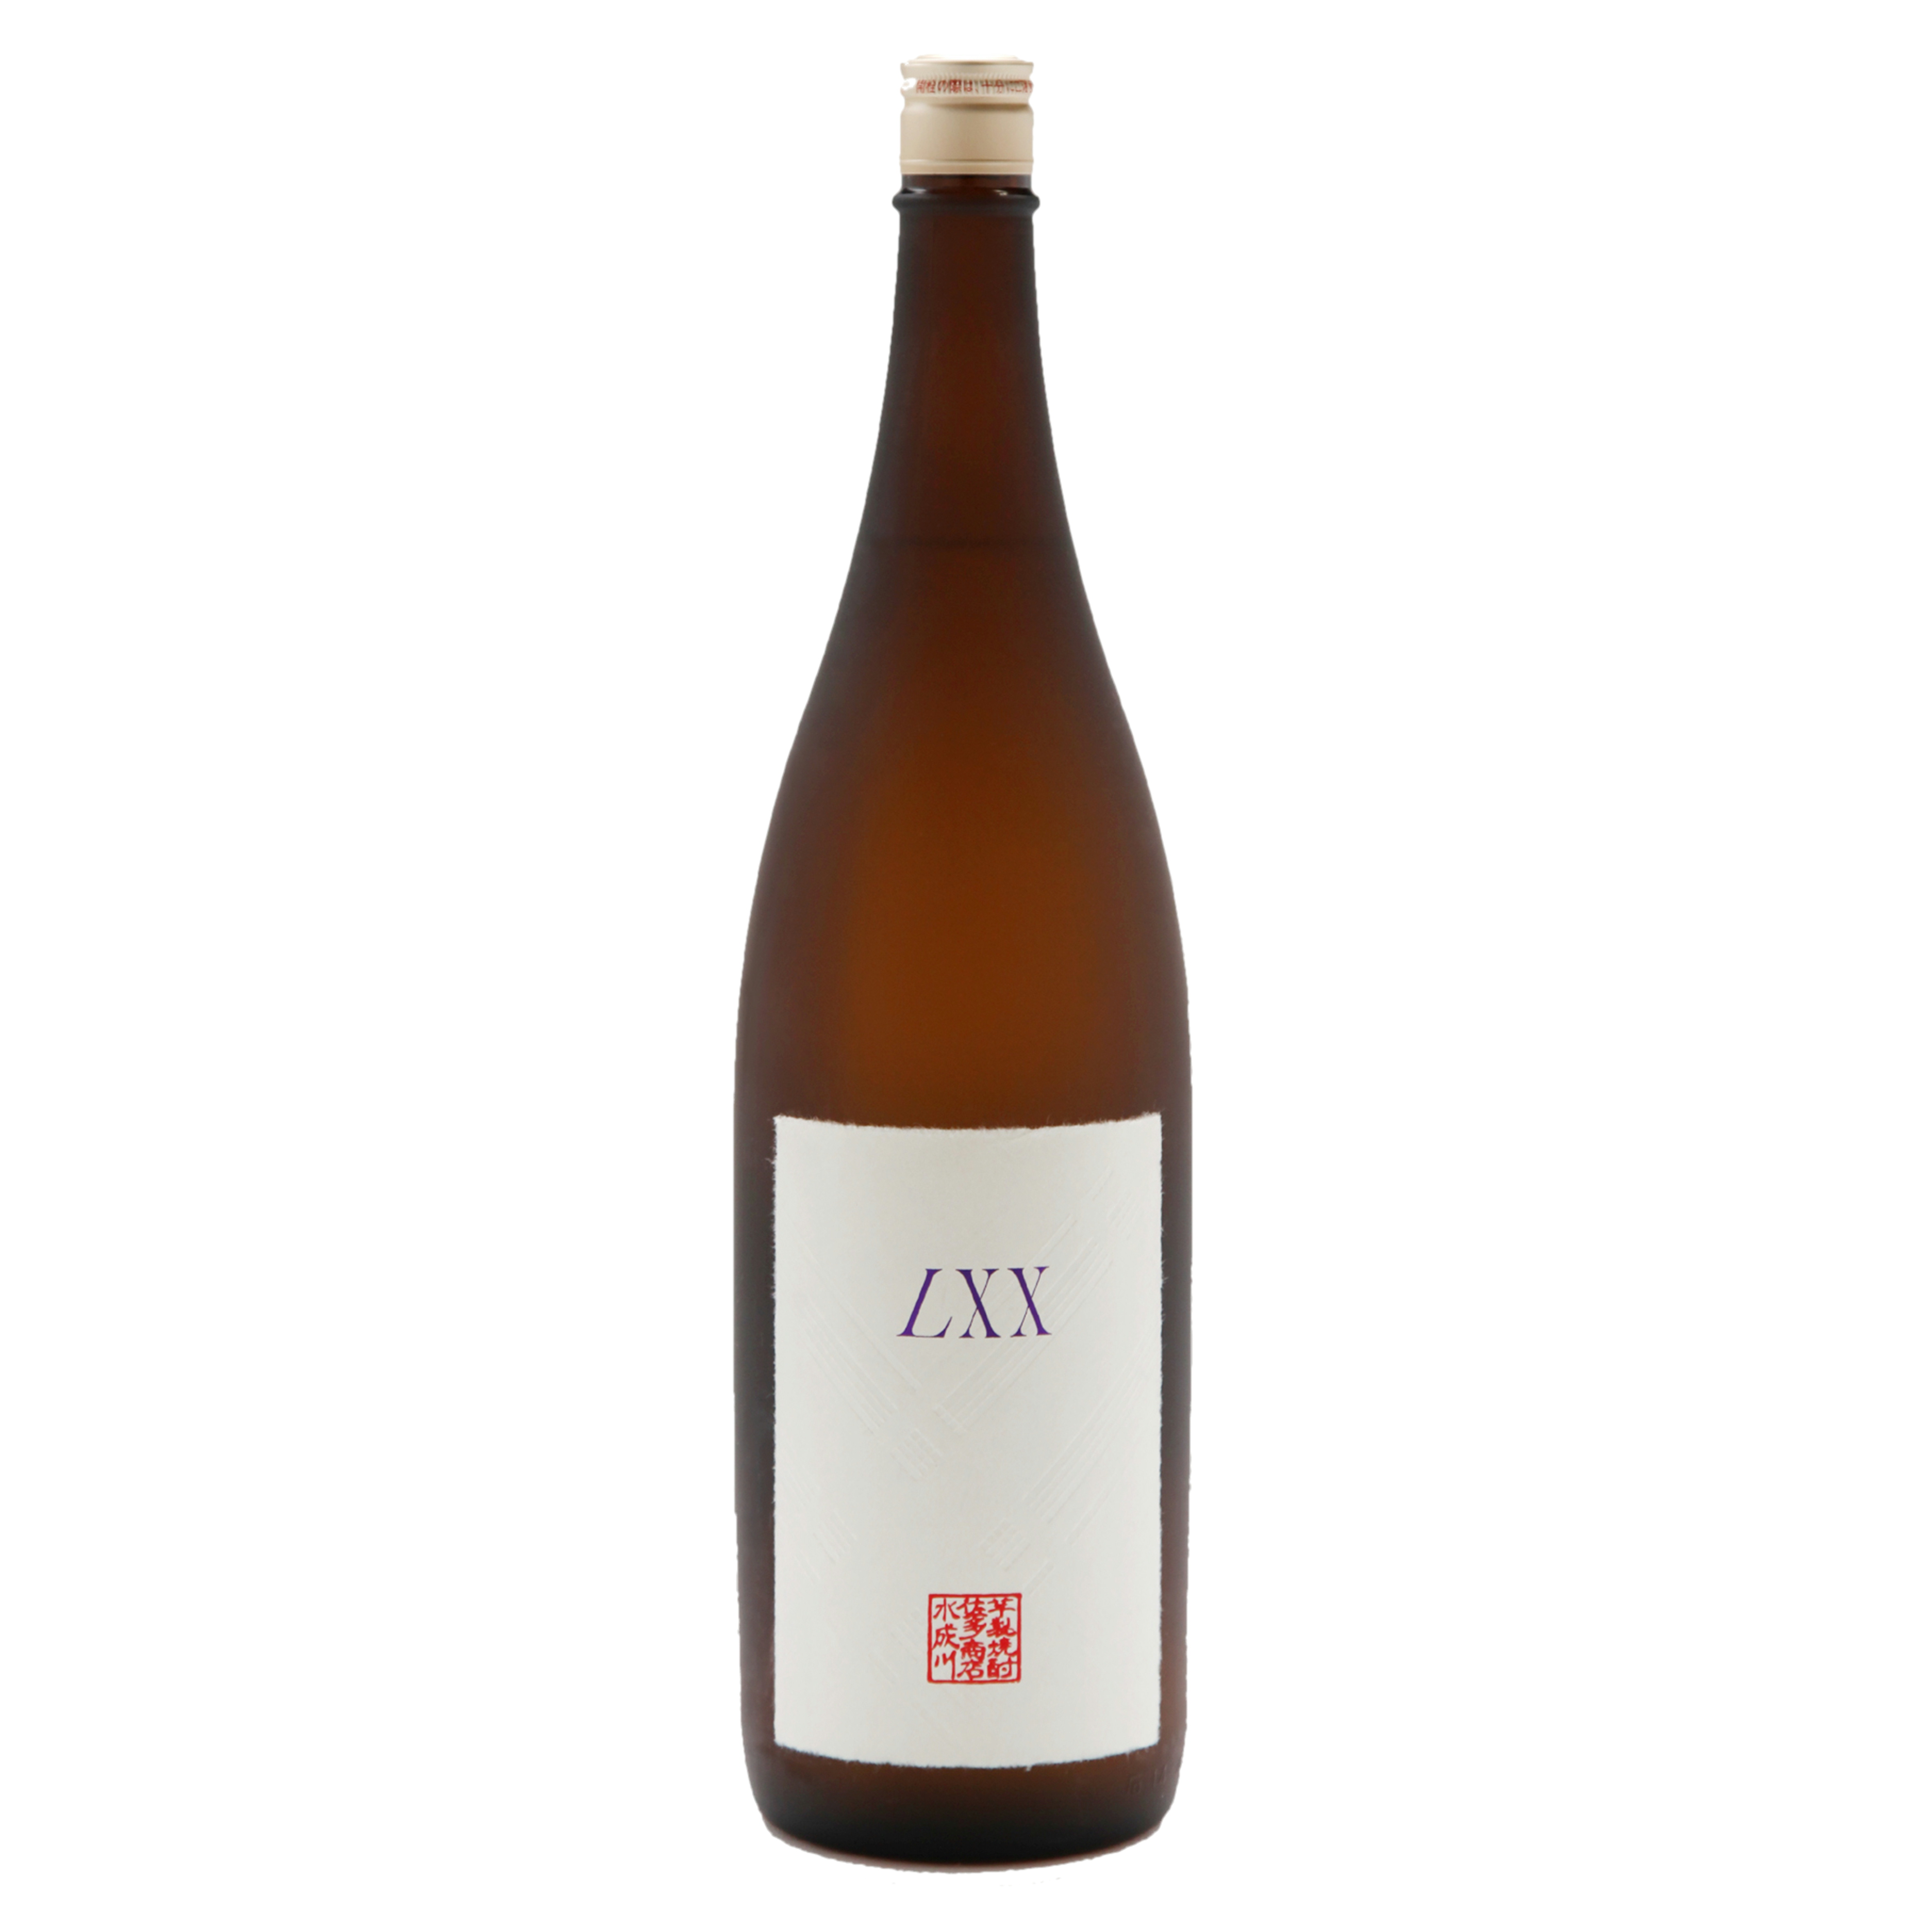 LXX(ななじゅう) 720ml